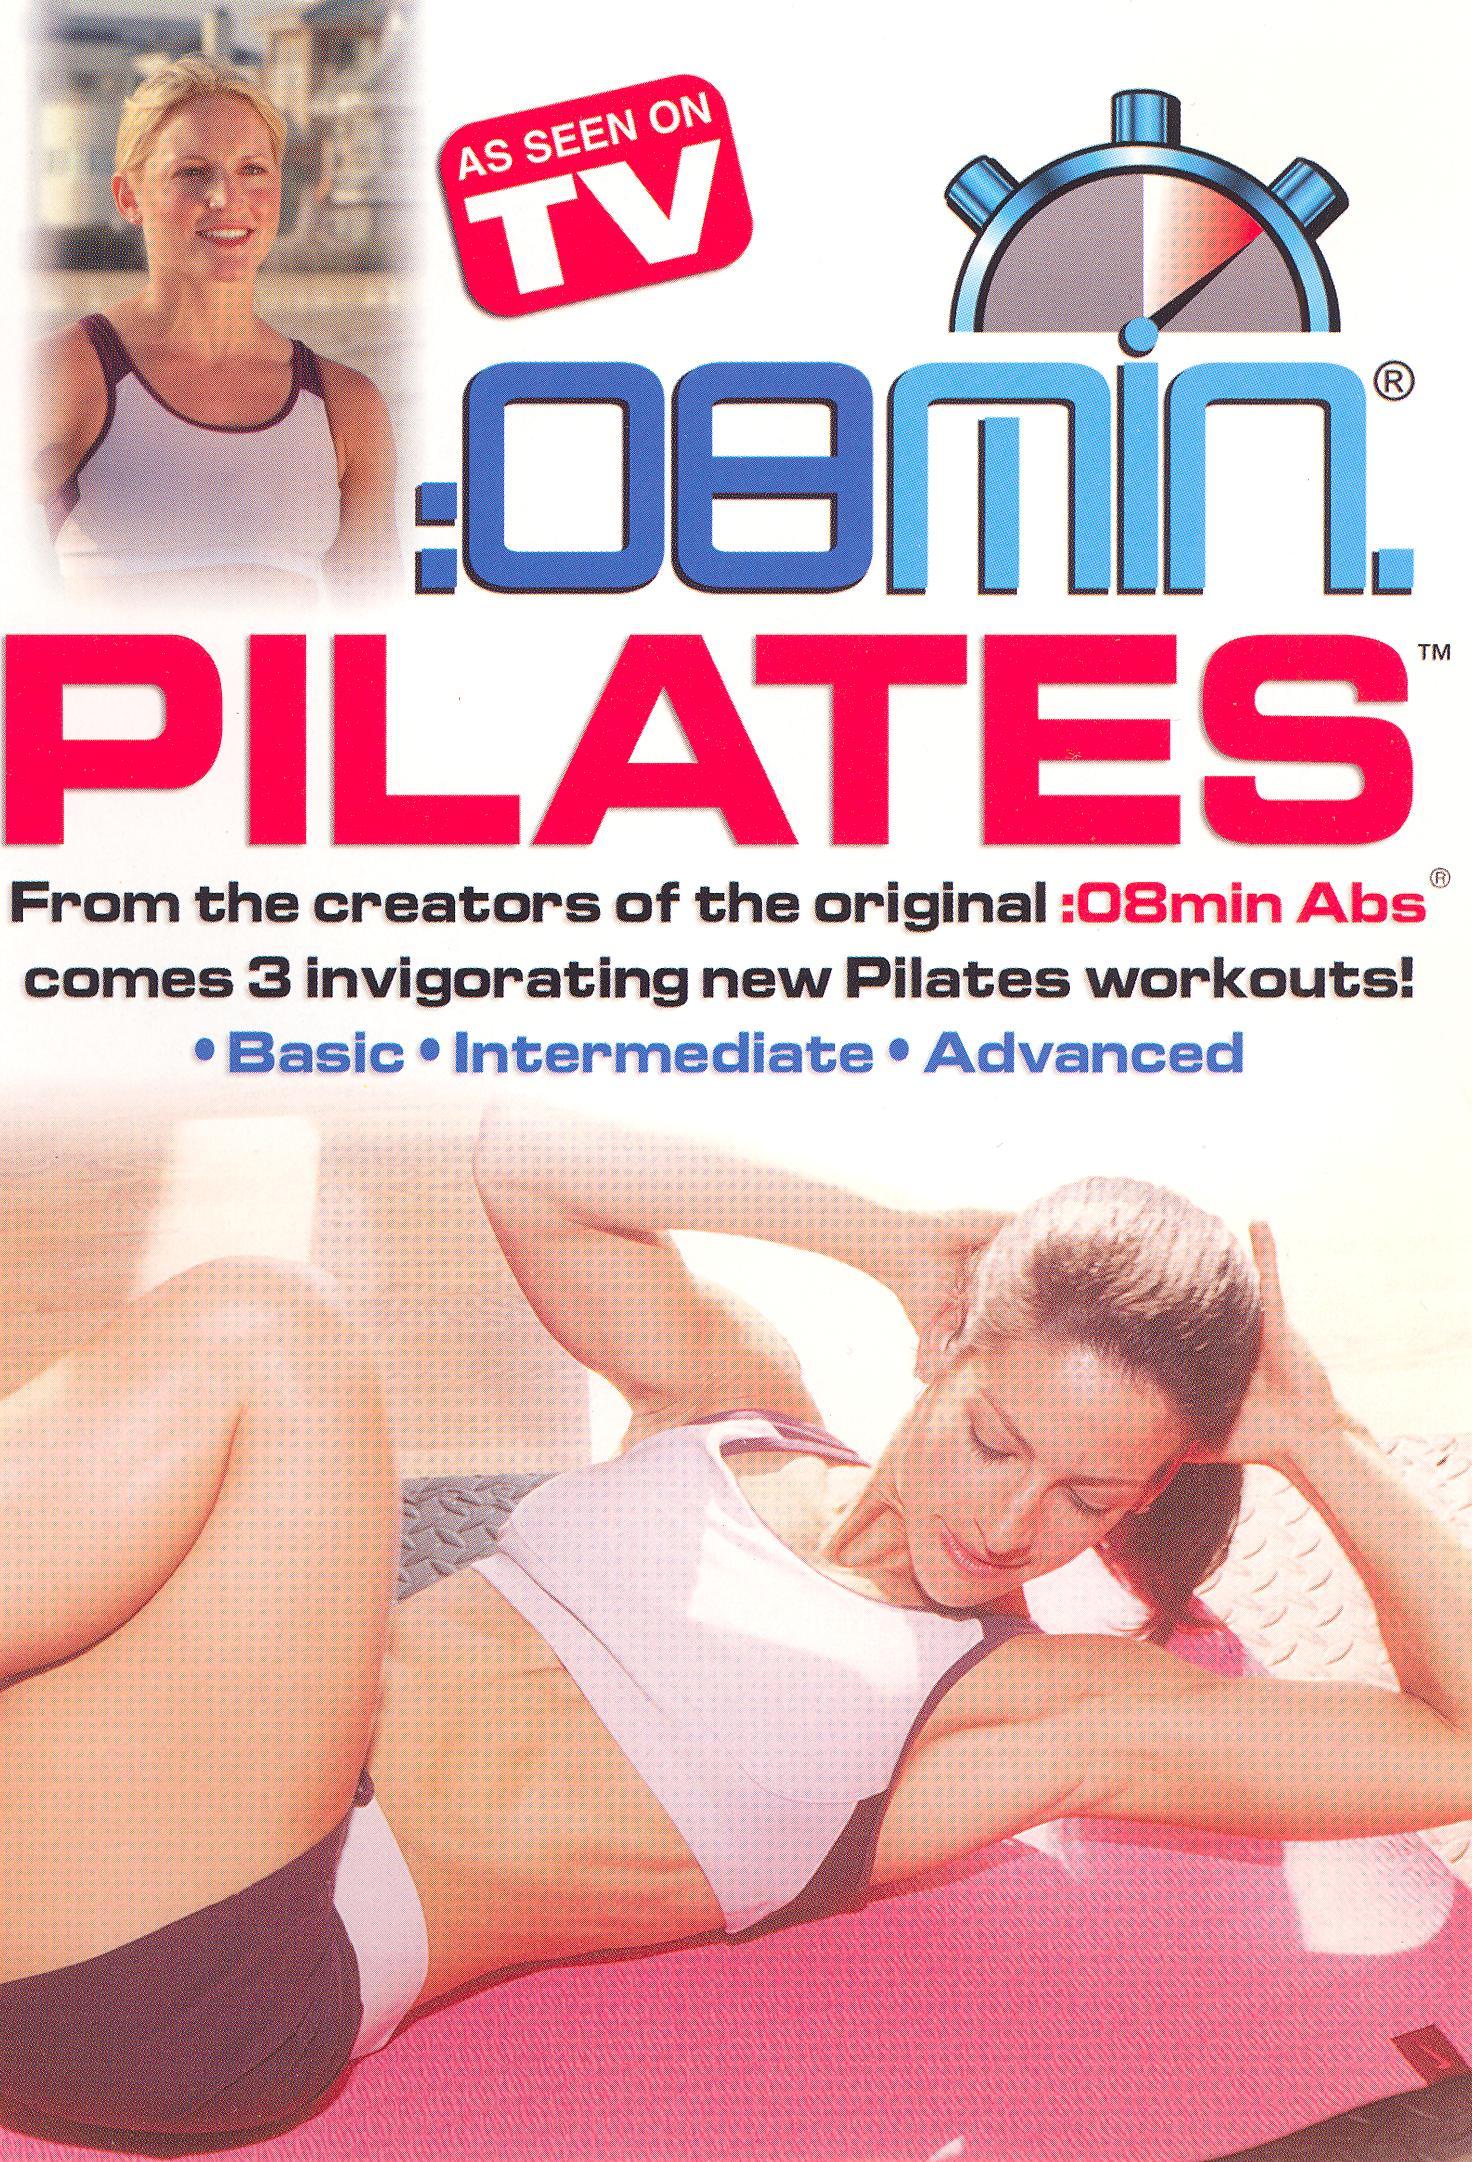 8 Minute Pilates